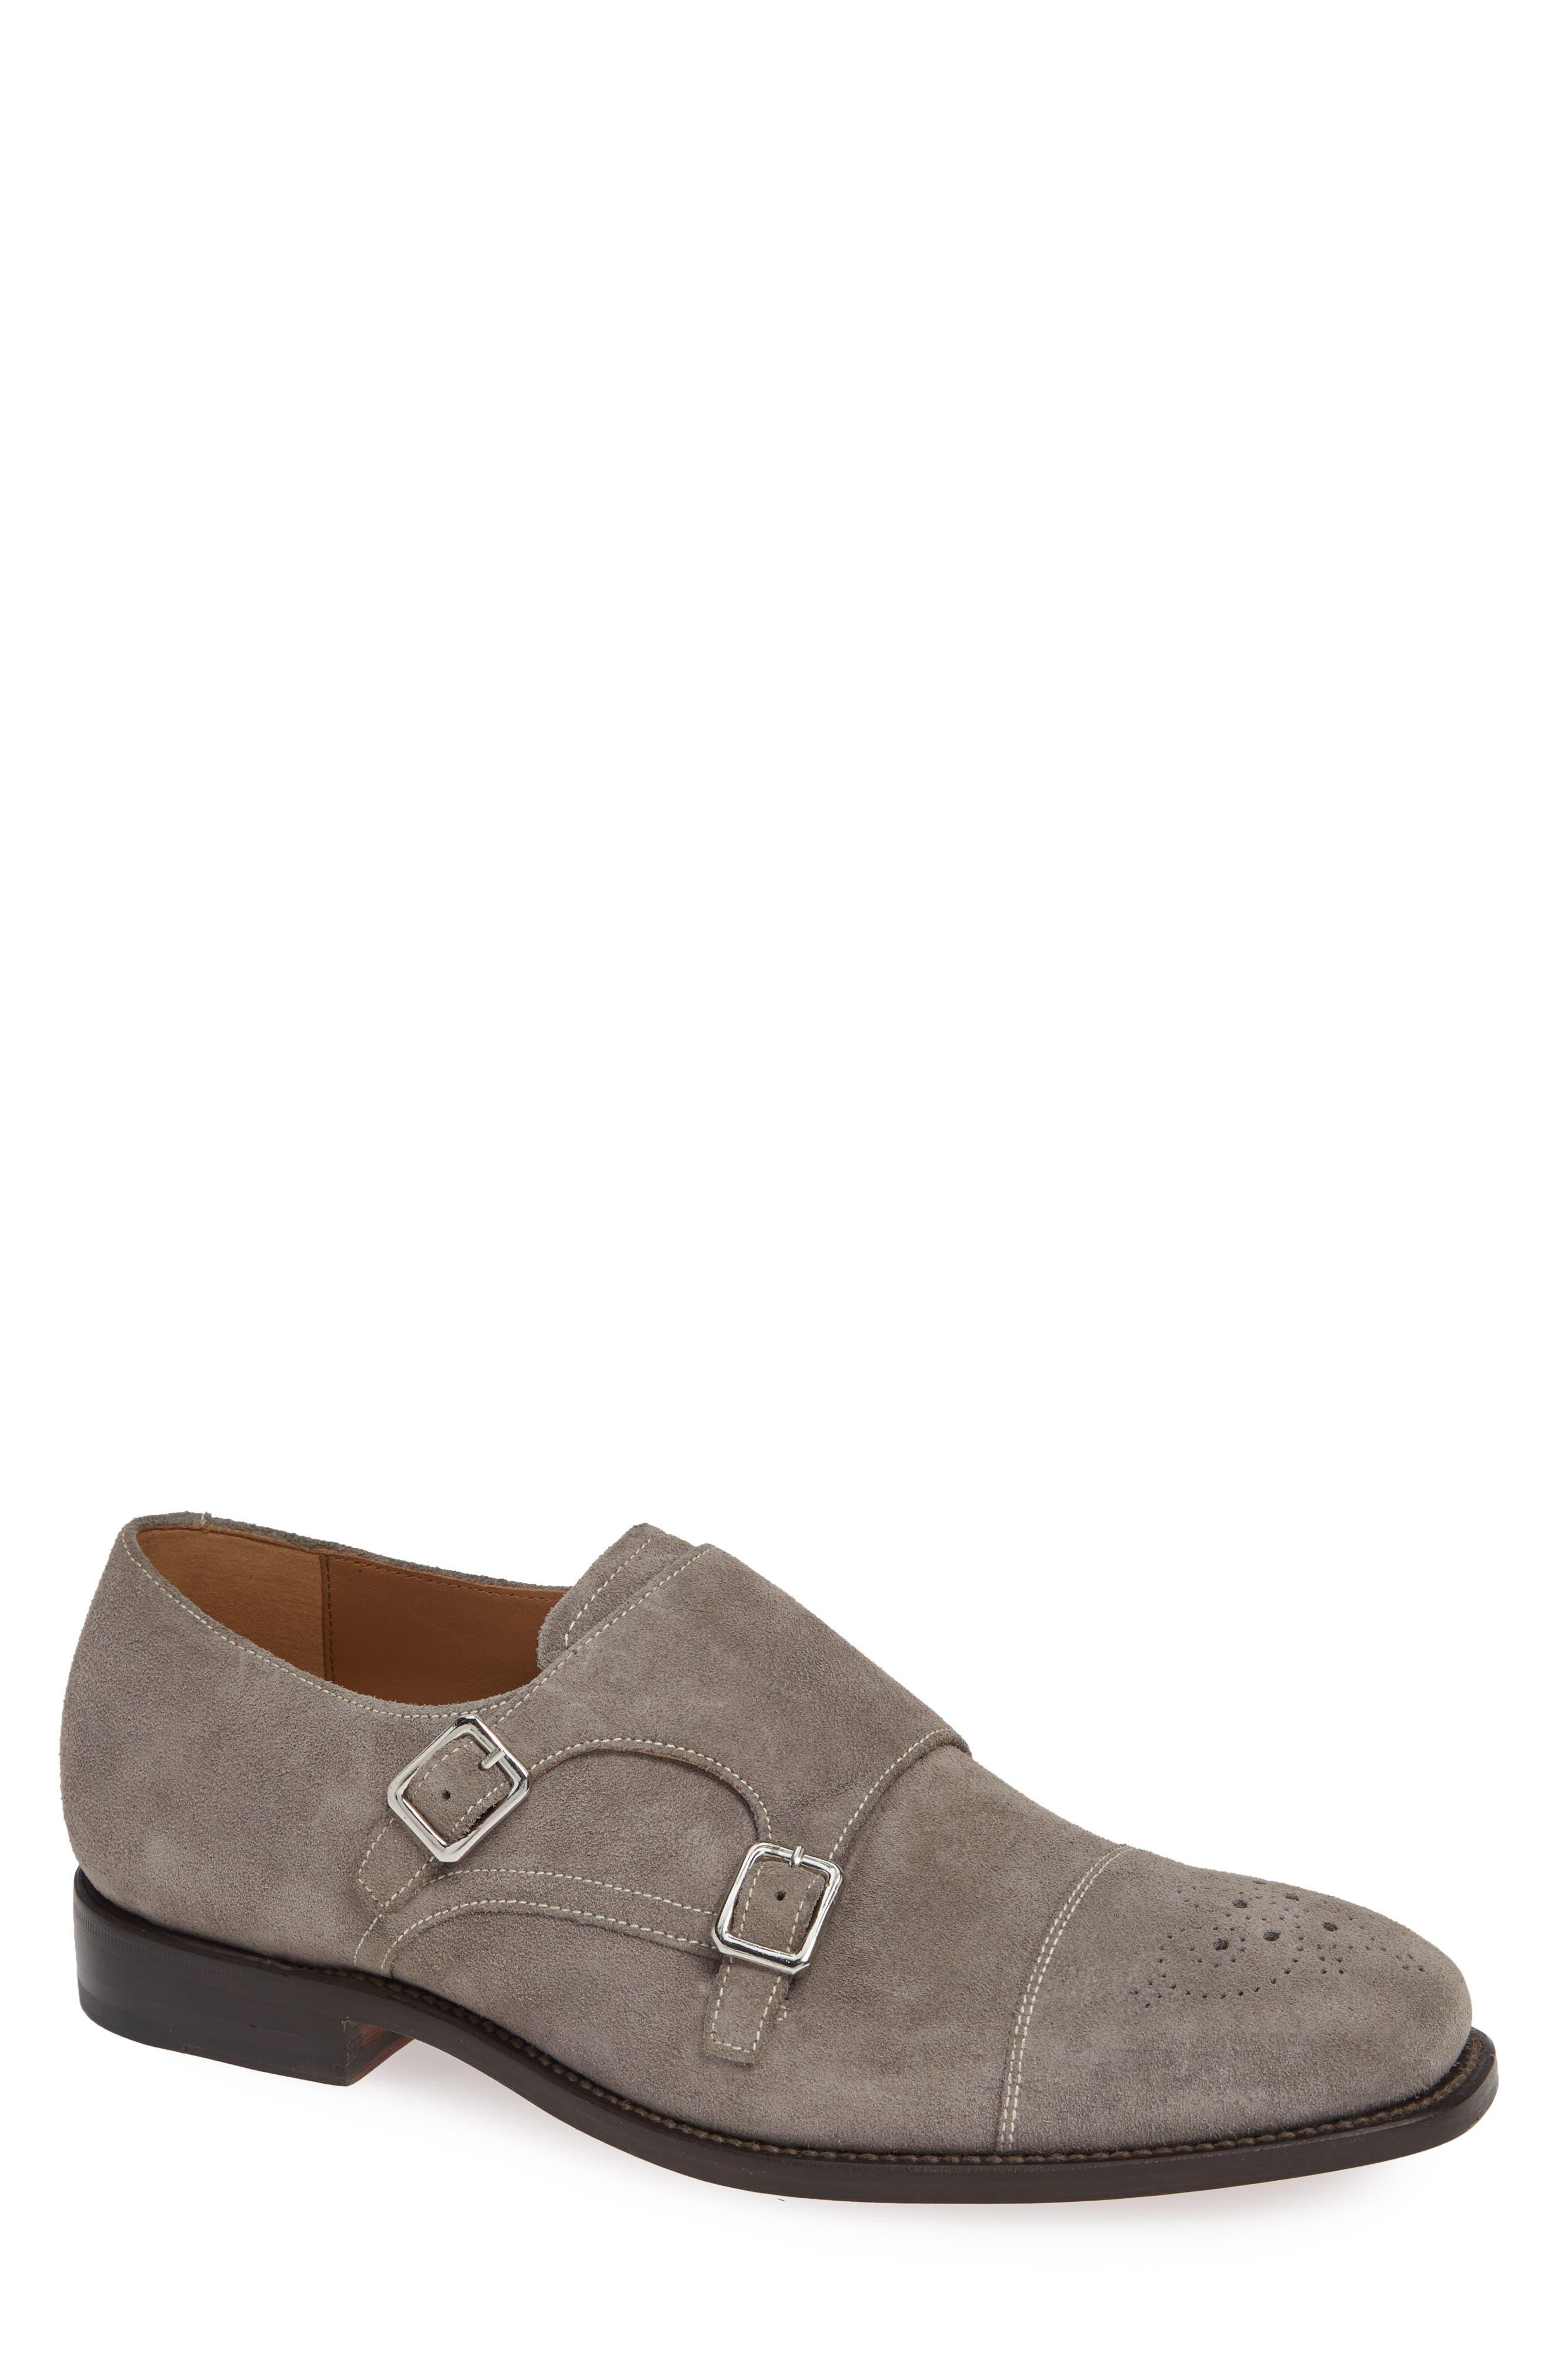 Sausalito Double Monk Strap Shoe,                         Main,                         color, GREY SUEDE